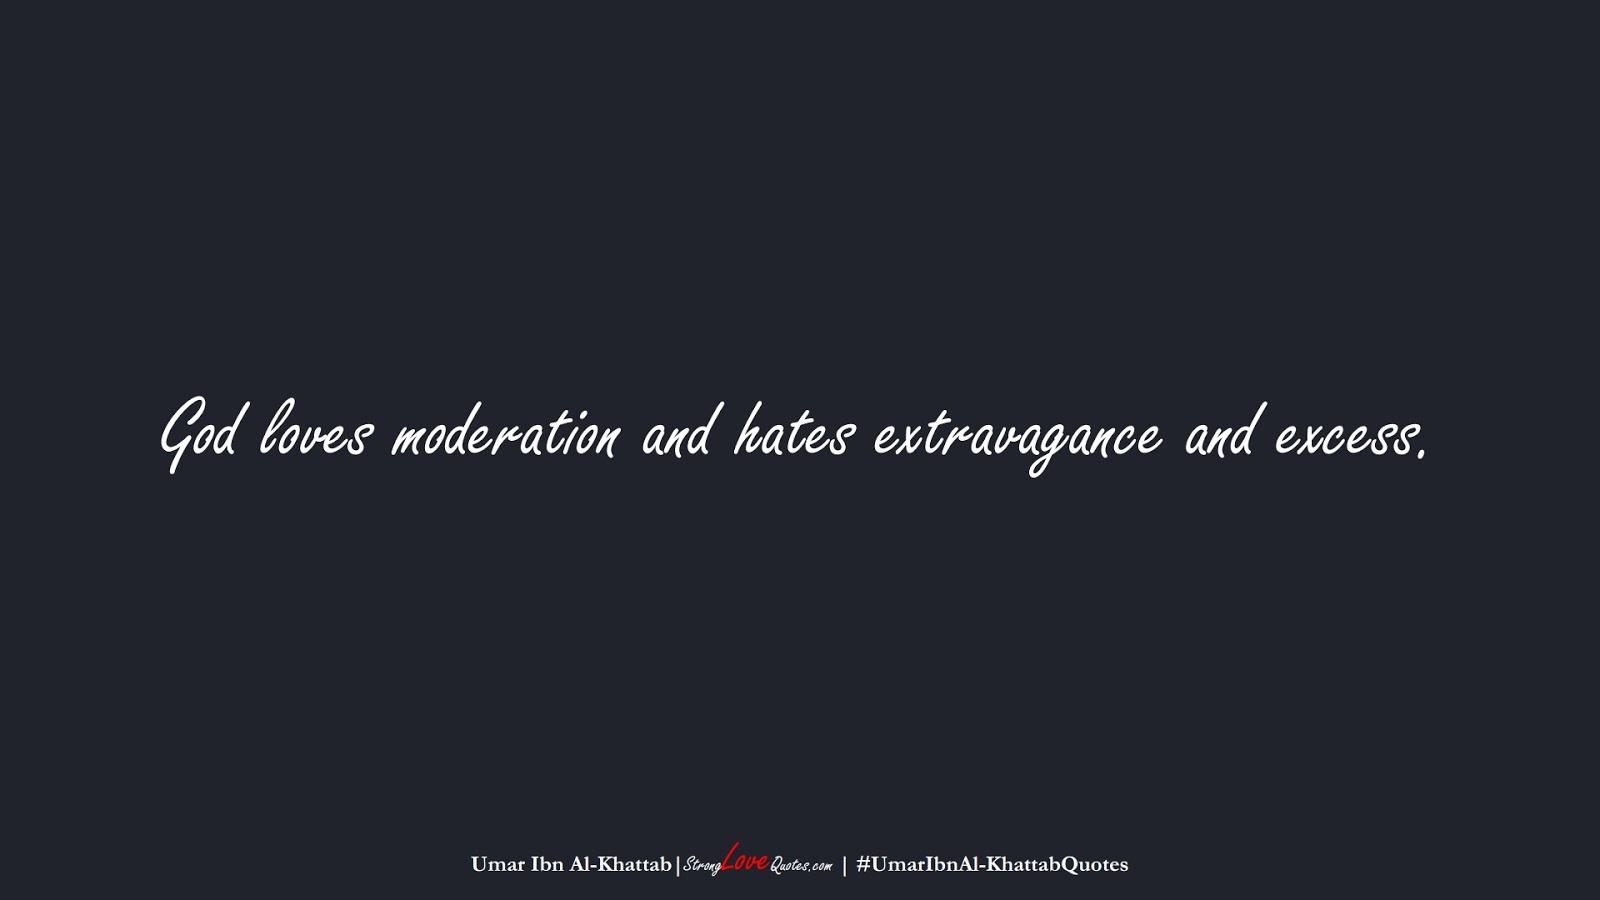 God loves moderation and hates extravagance and excess. (Umar Ibn Al-Khattab);  #UmarIbnAl-KhattabQuotes